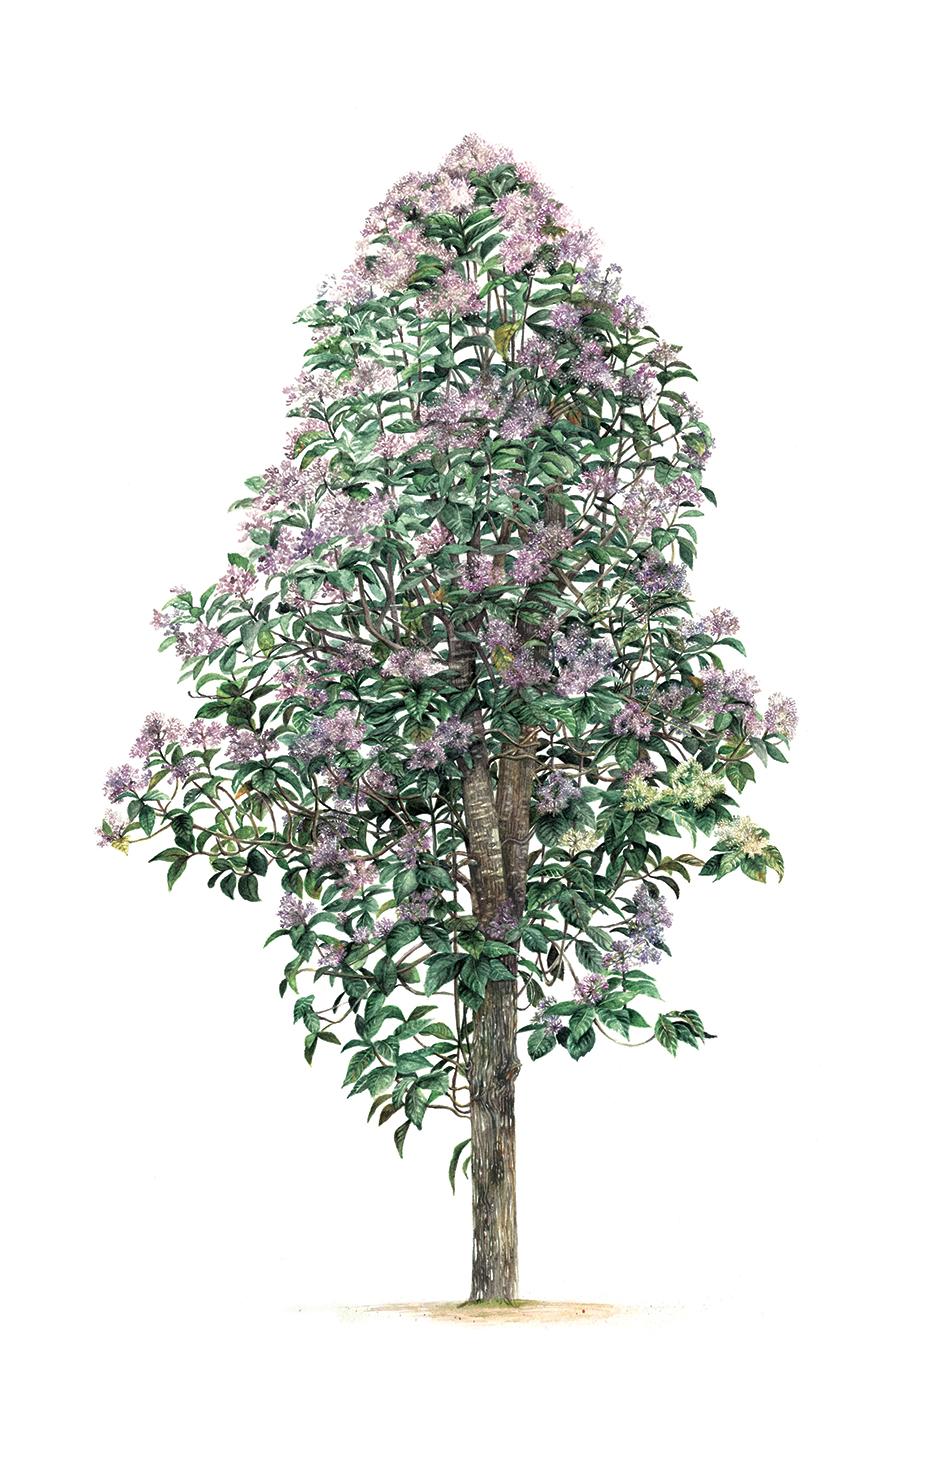 A Vernonia arborea tree